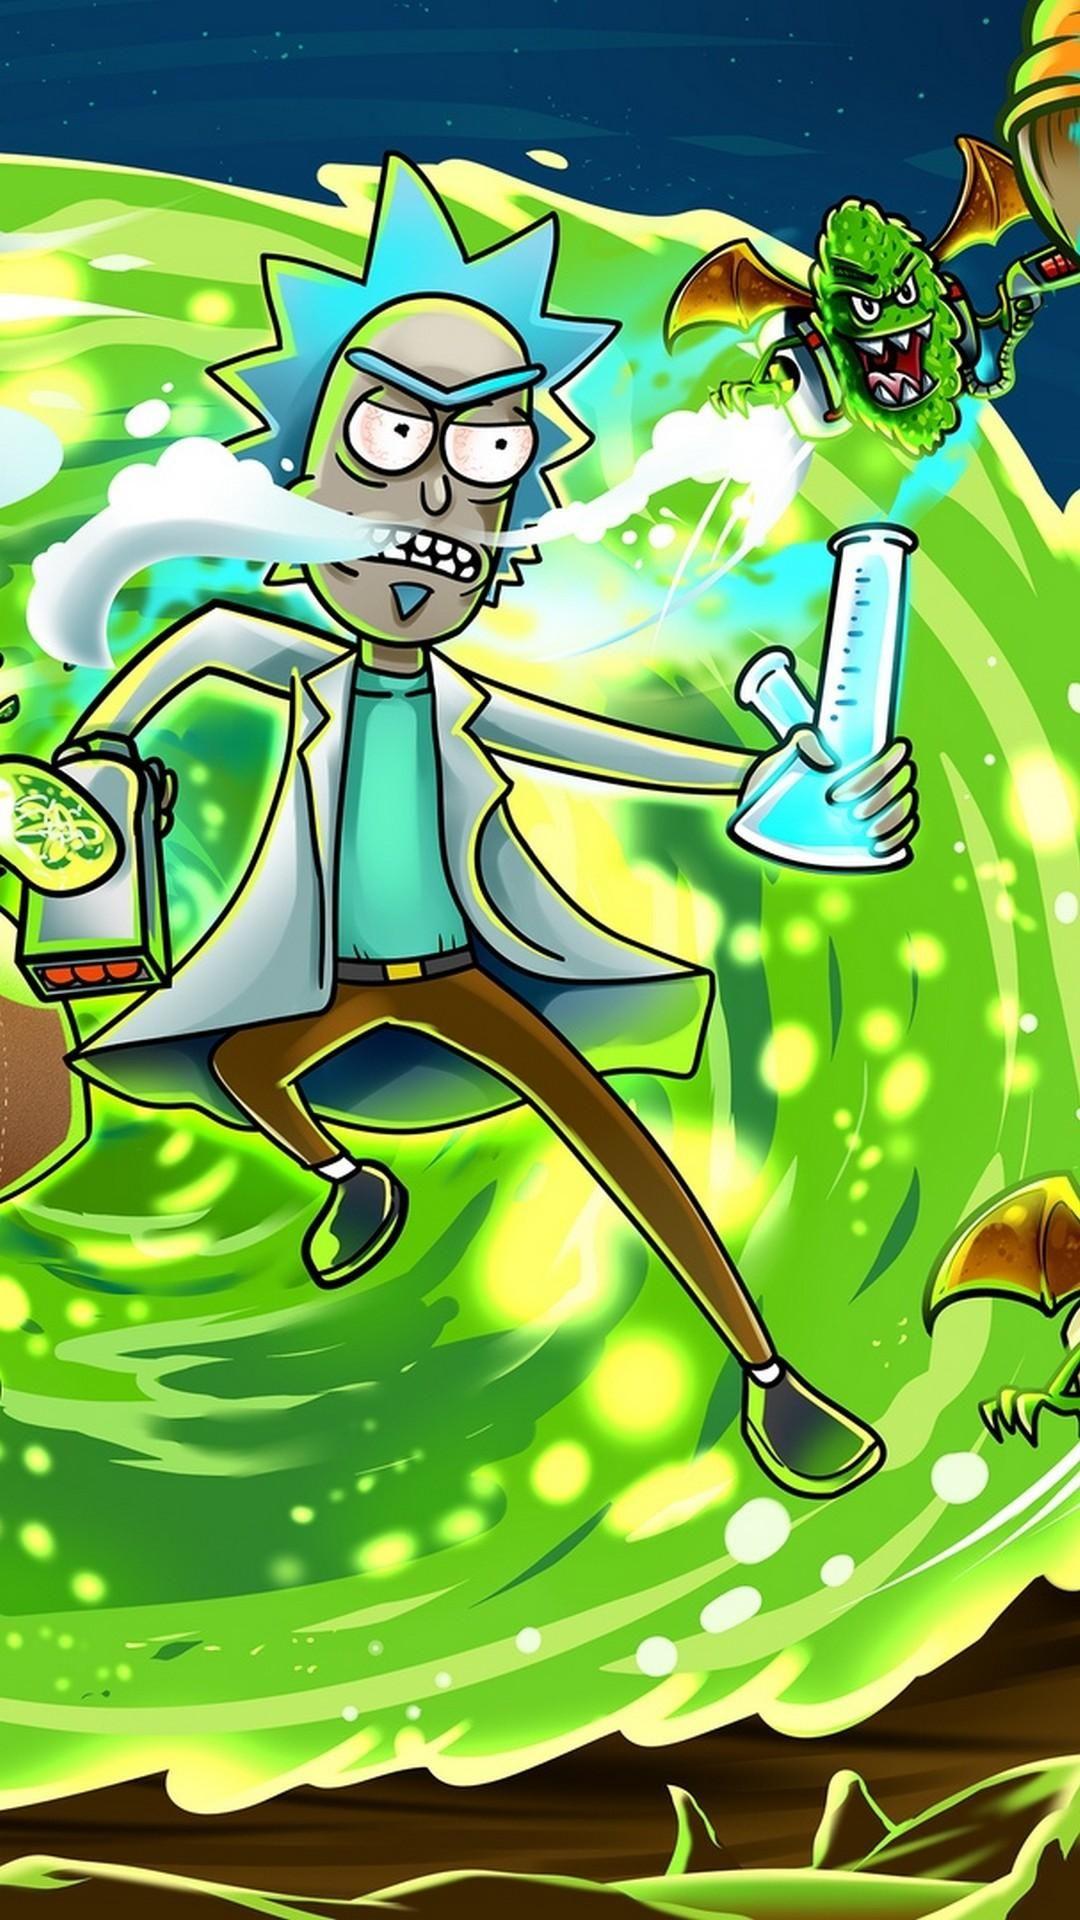 Rick And Morty Rick And Morty Wallpapers Morty Wallpaper Cartoon Wallpaper